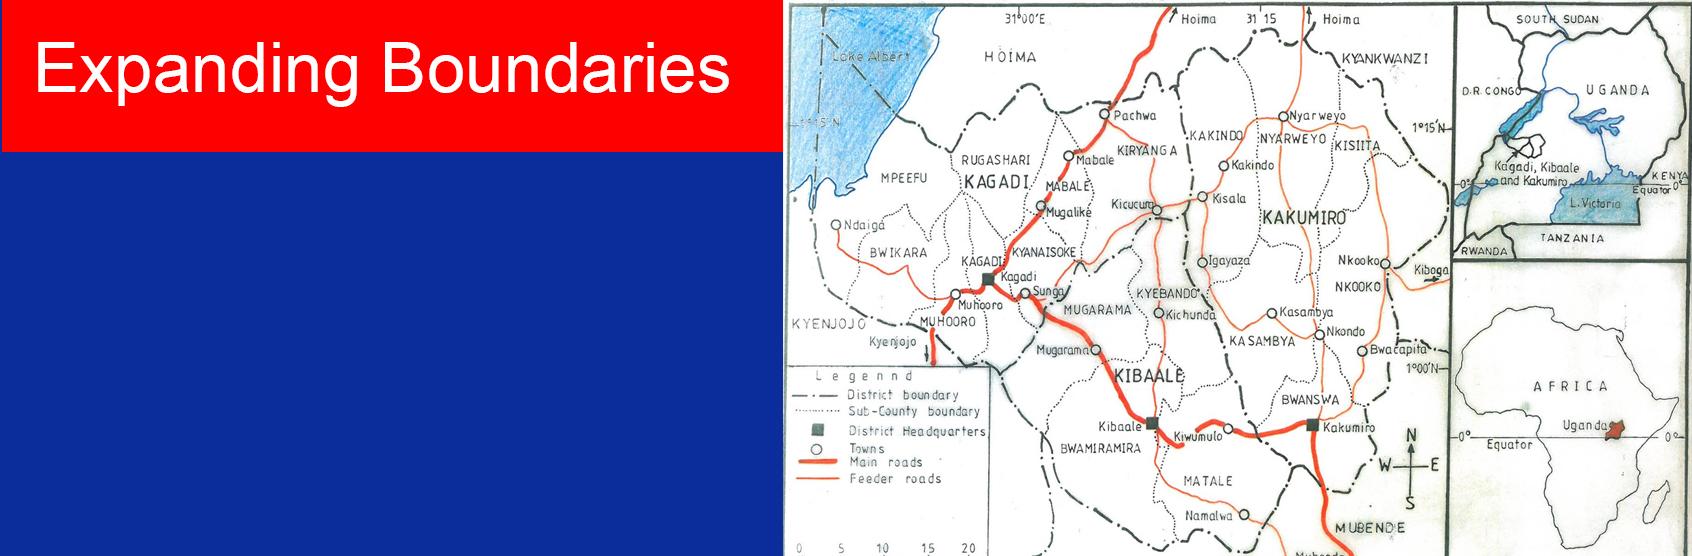 The ARU Academic Research Team develops the map of Kagadi, Kibaale and Kakumiro Districts